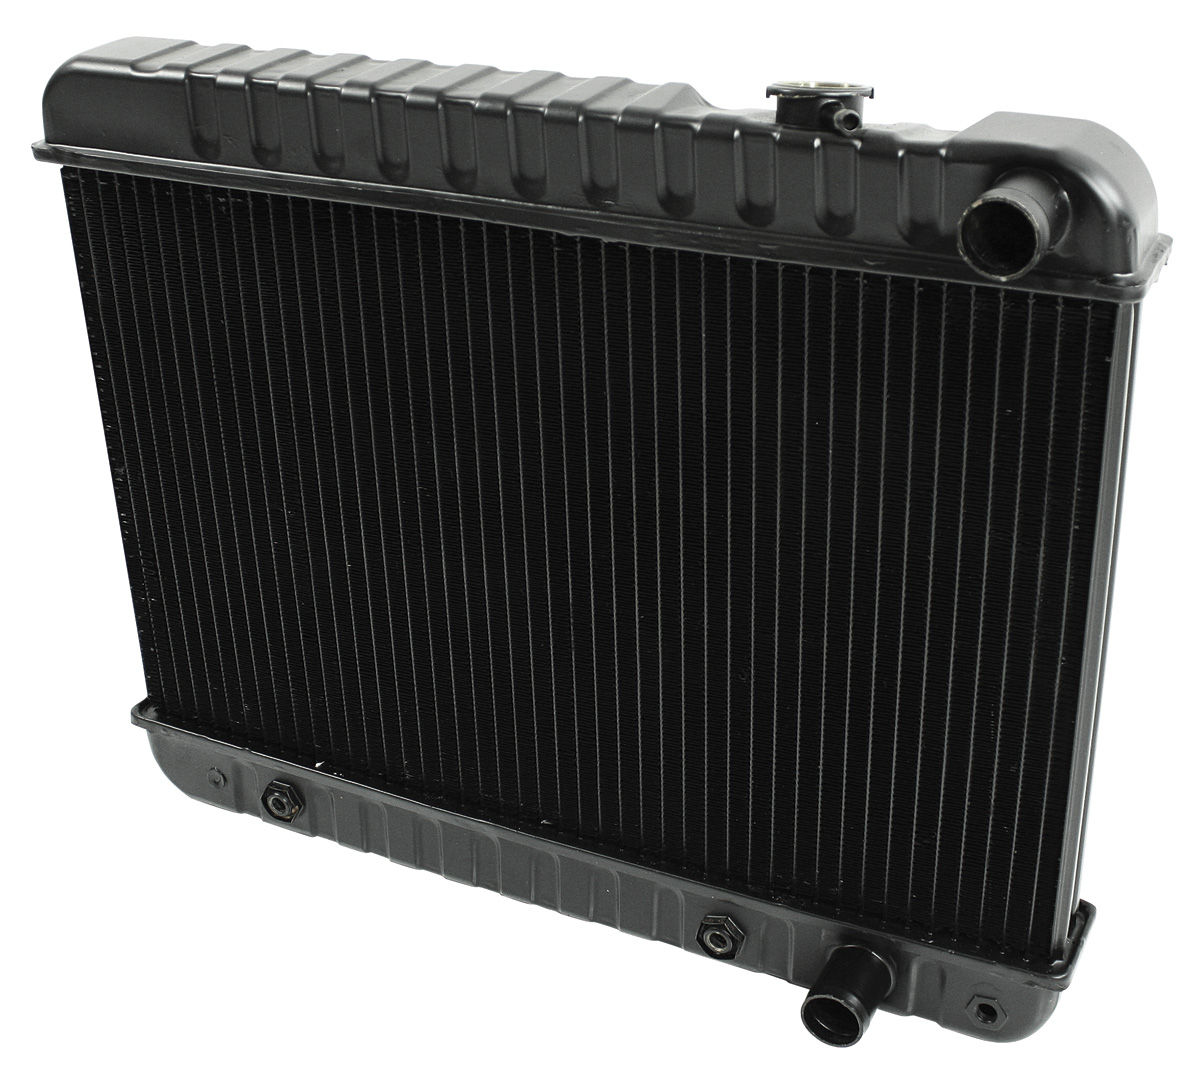 "Radiator, 1961-63 Skylark, V8, Automatic, 2-Row, 12-3/8"" X 23-1/8"" X 1-1/4"""